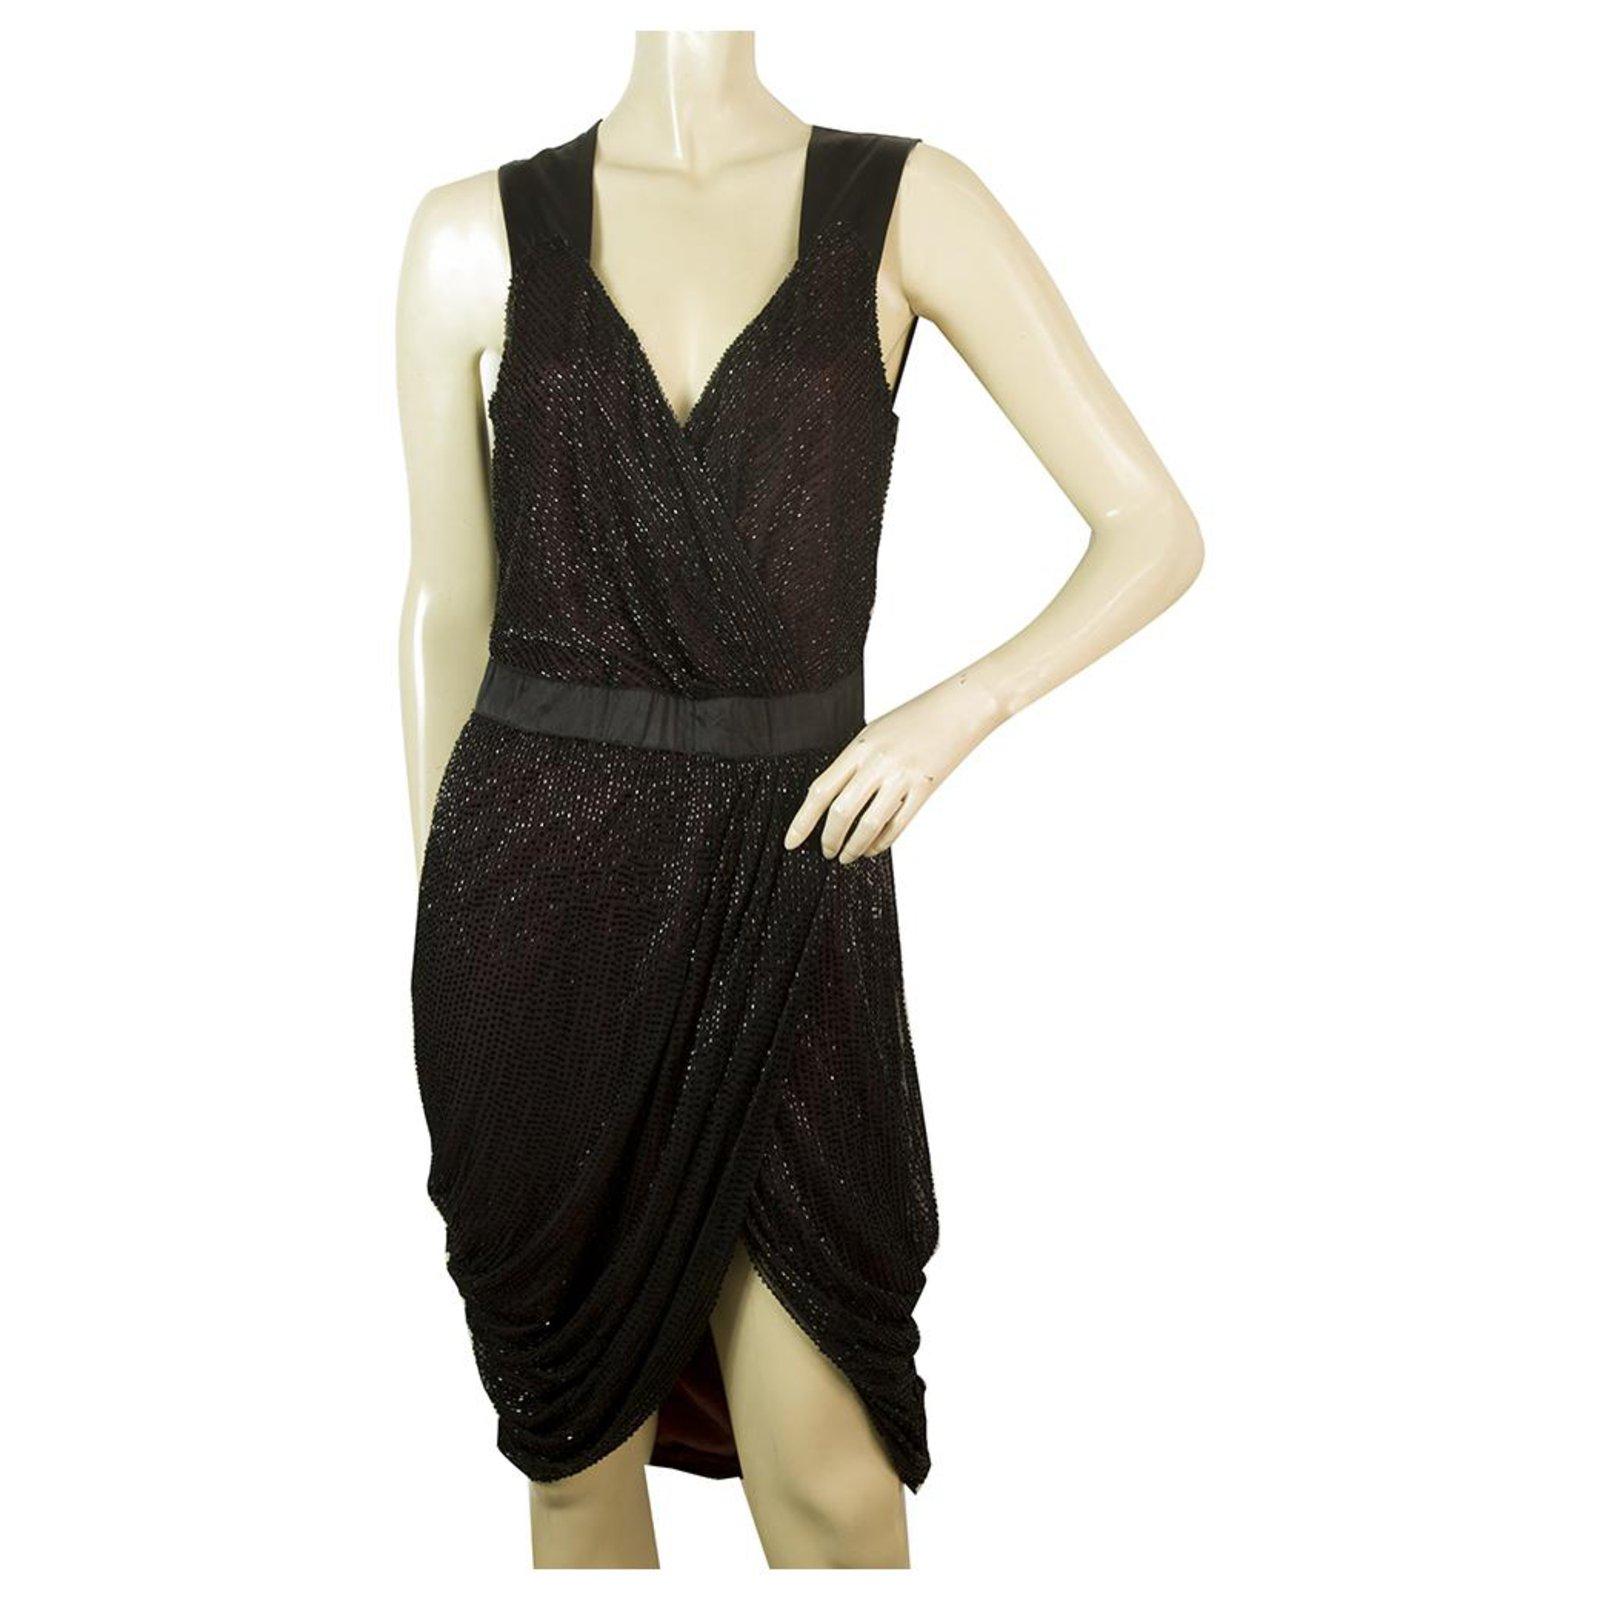 Robes Pinko Pinko Black Mini Robe Tulipe Drapee Sans Manches Avec Perles Sz 44 Polyamide Noir Ref 172636 Joli Closet